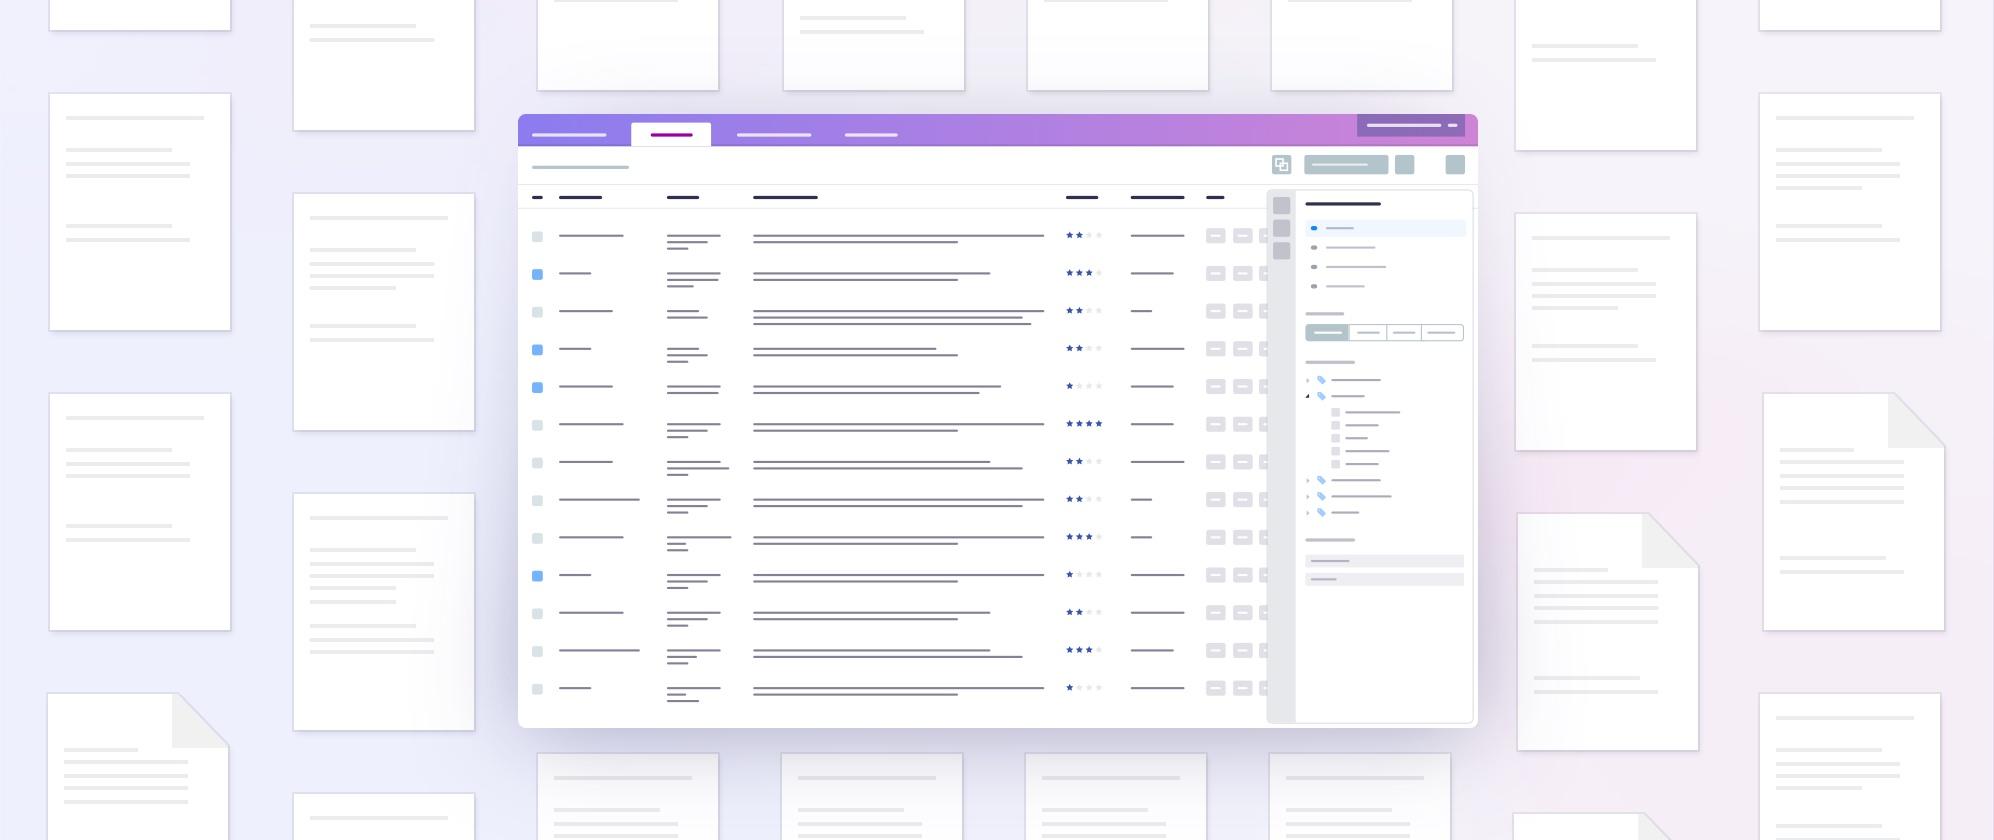 Data Sources for Case Management Software